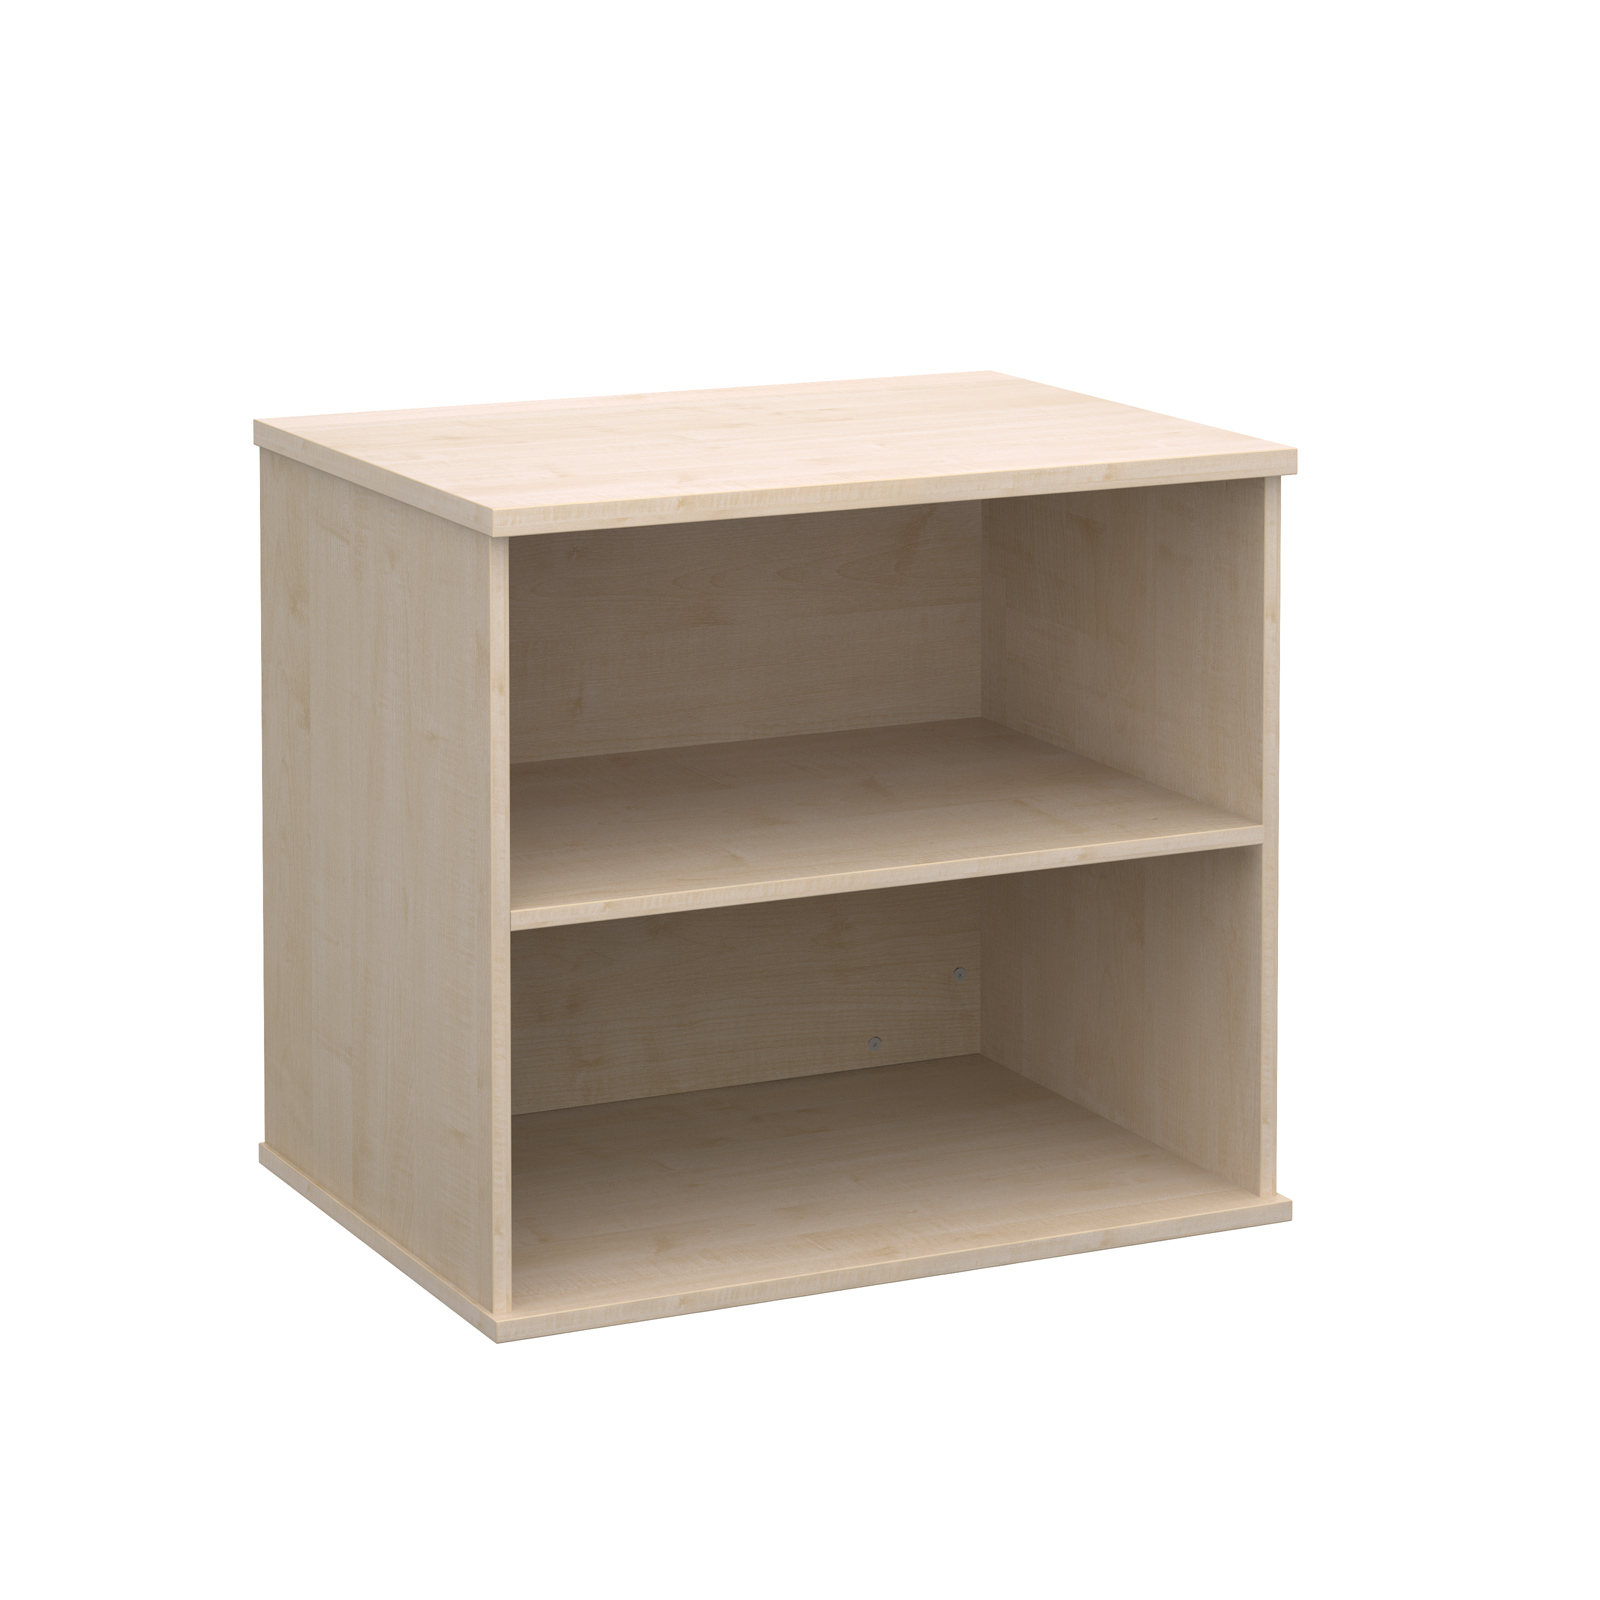 Deluxe desk high bookcase 600mm deep - maple